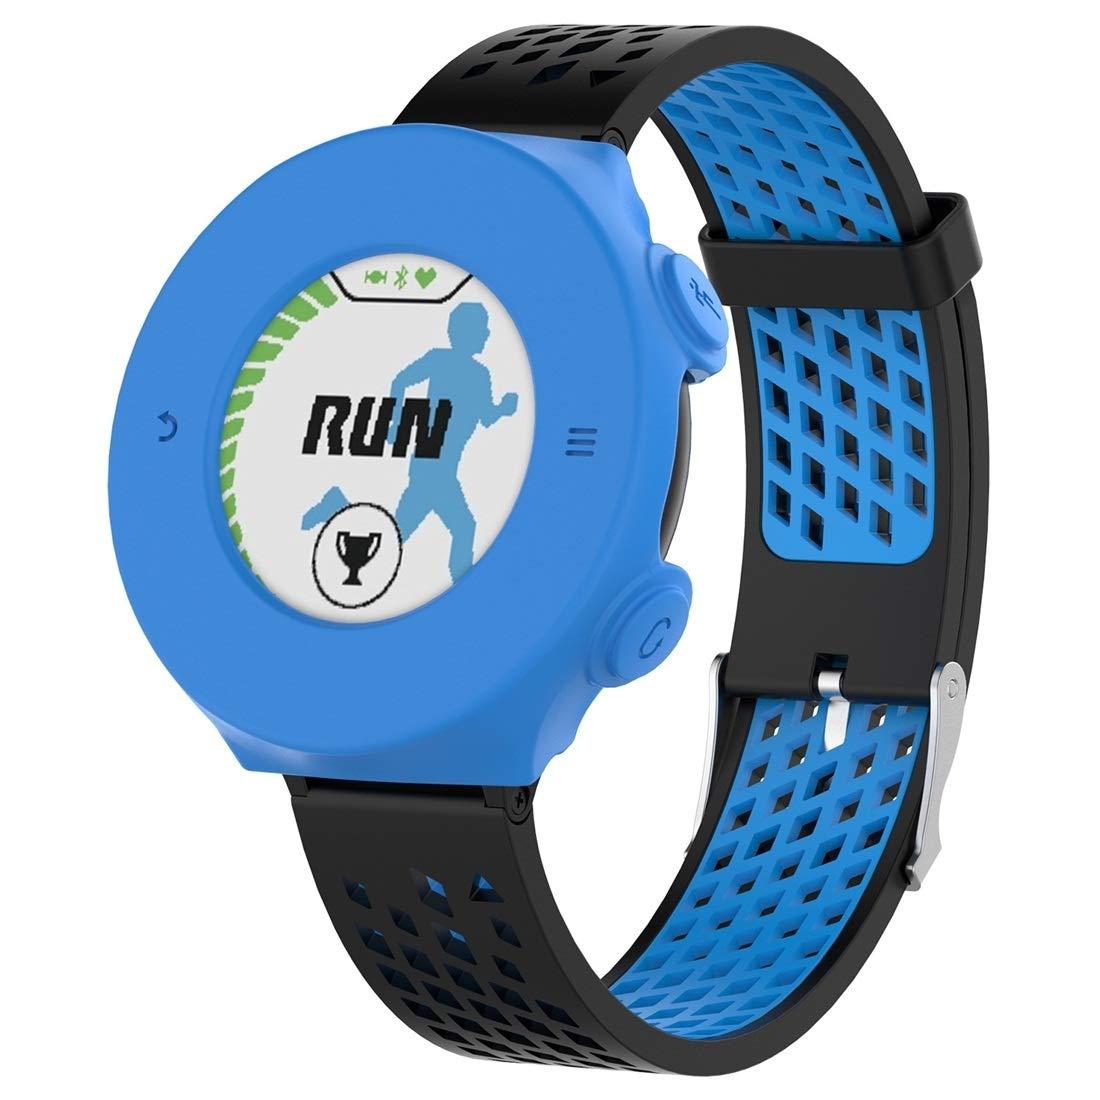 Reloj de la Caja Protectora Sunzimeng Smart Watch Funda Protectora ...